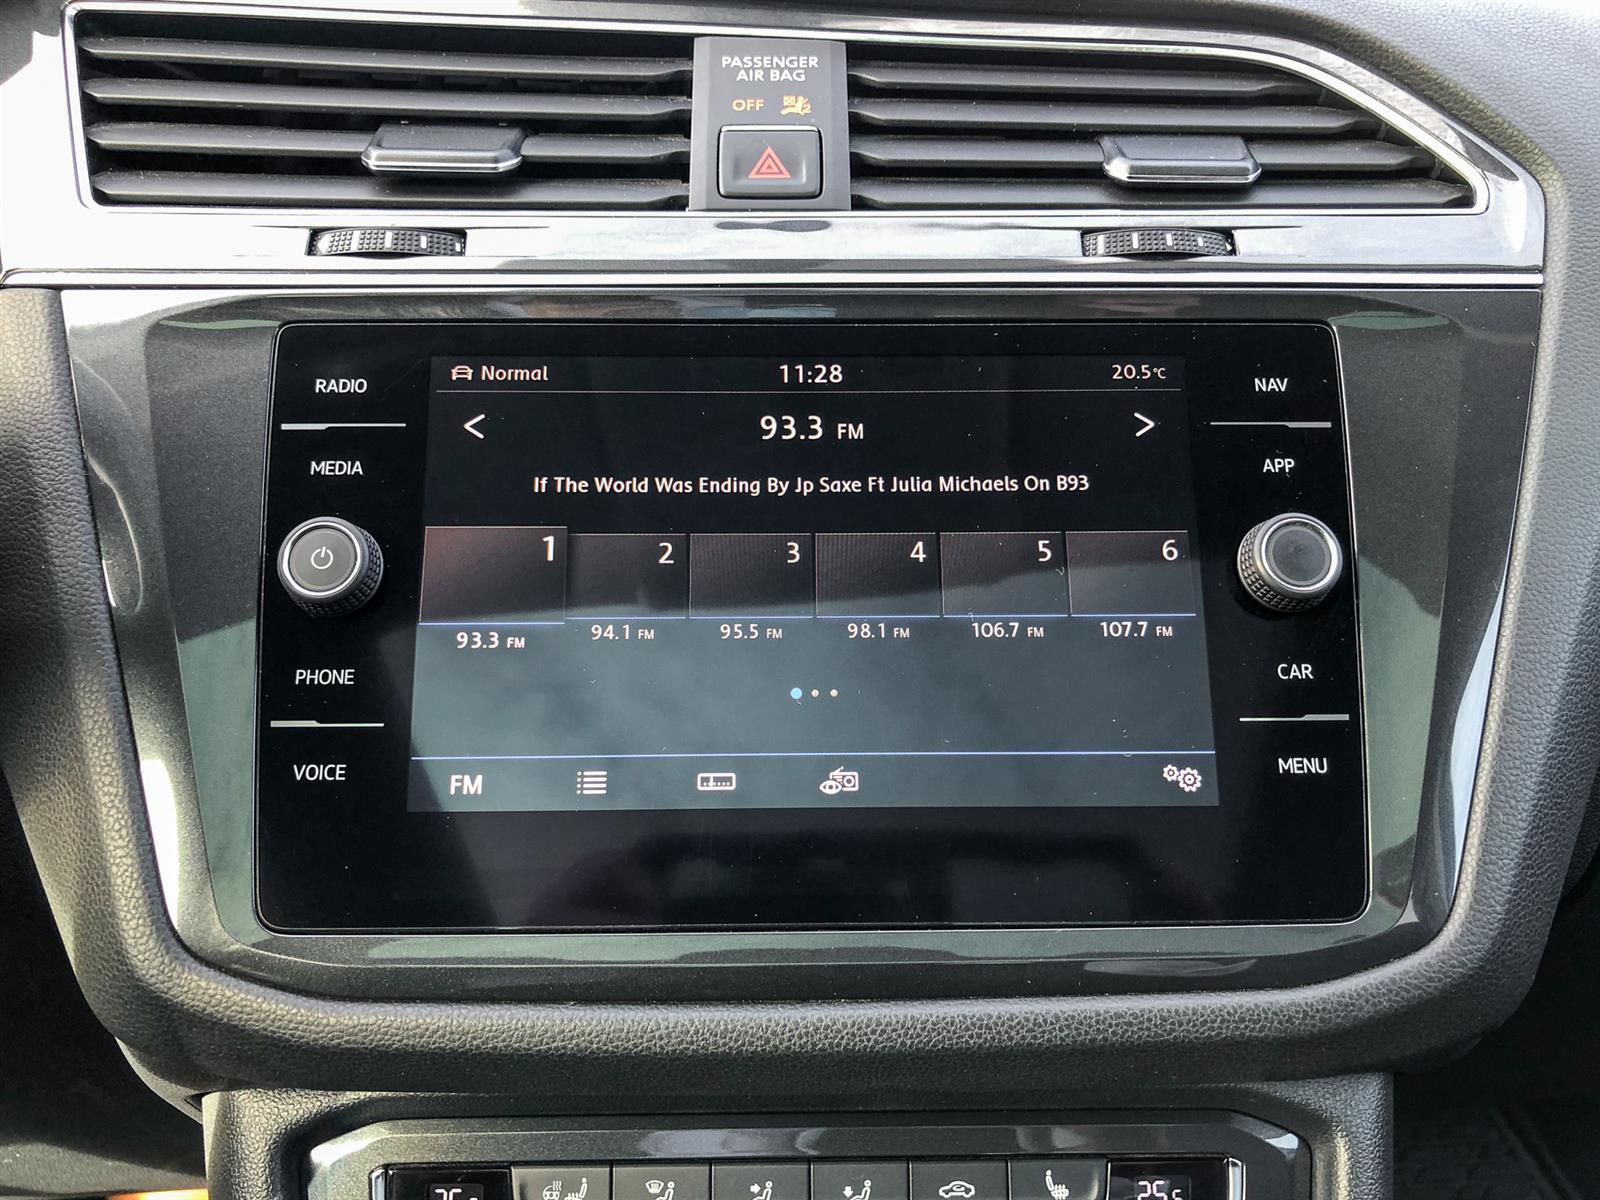 2018 Volkswagen Tiguan HIGHLINE | 2.0L I4 | AWD | HEATED STEERING WHEEL | SUNROOF